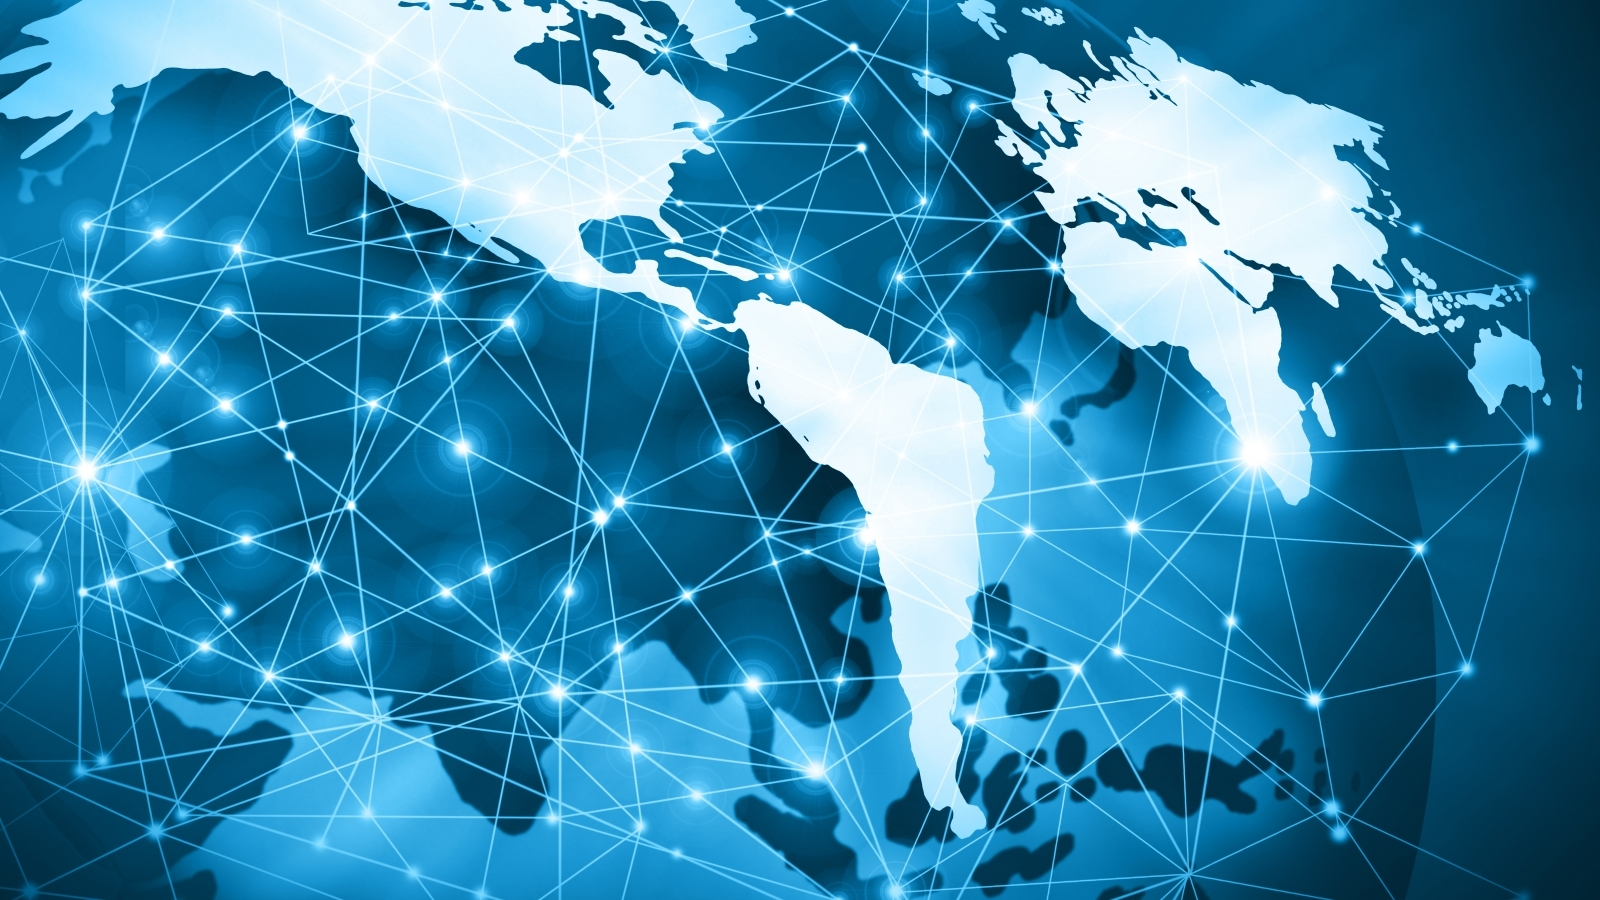 Homes Online One Internet Centre For International Governance Innovation